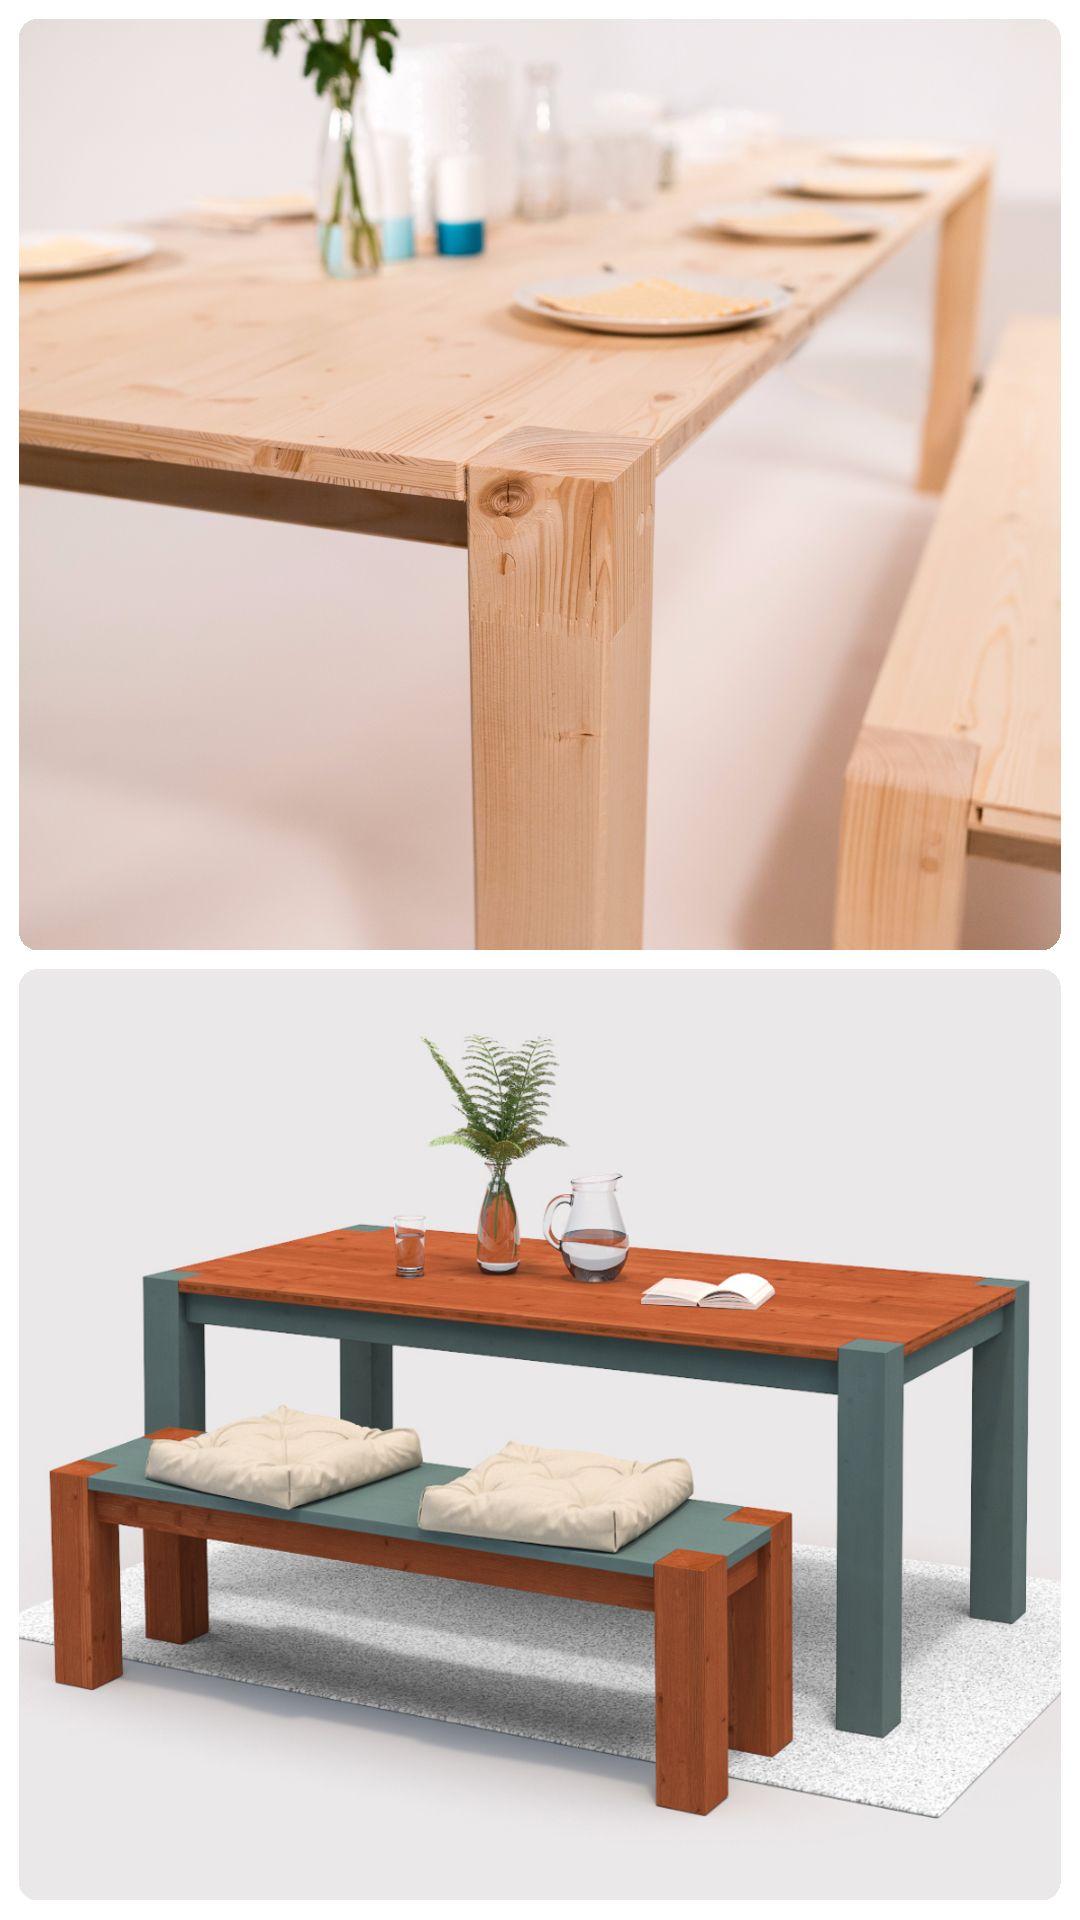 Tisch Maren Create By Obi Massiv Tisch Diy Mobel Mobel